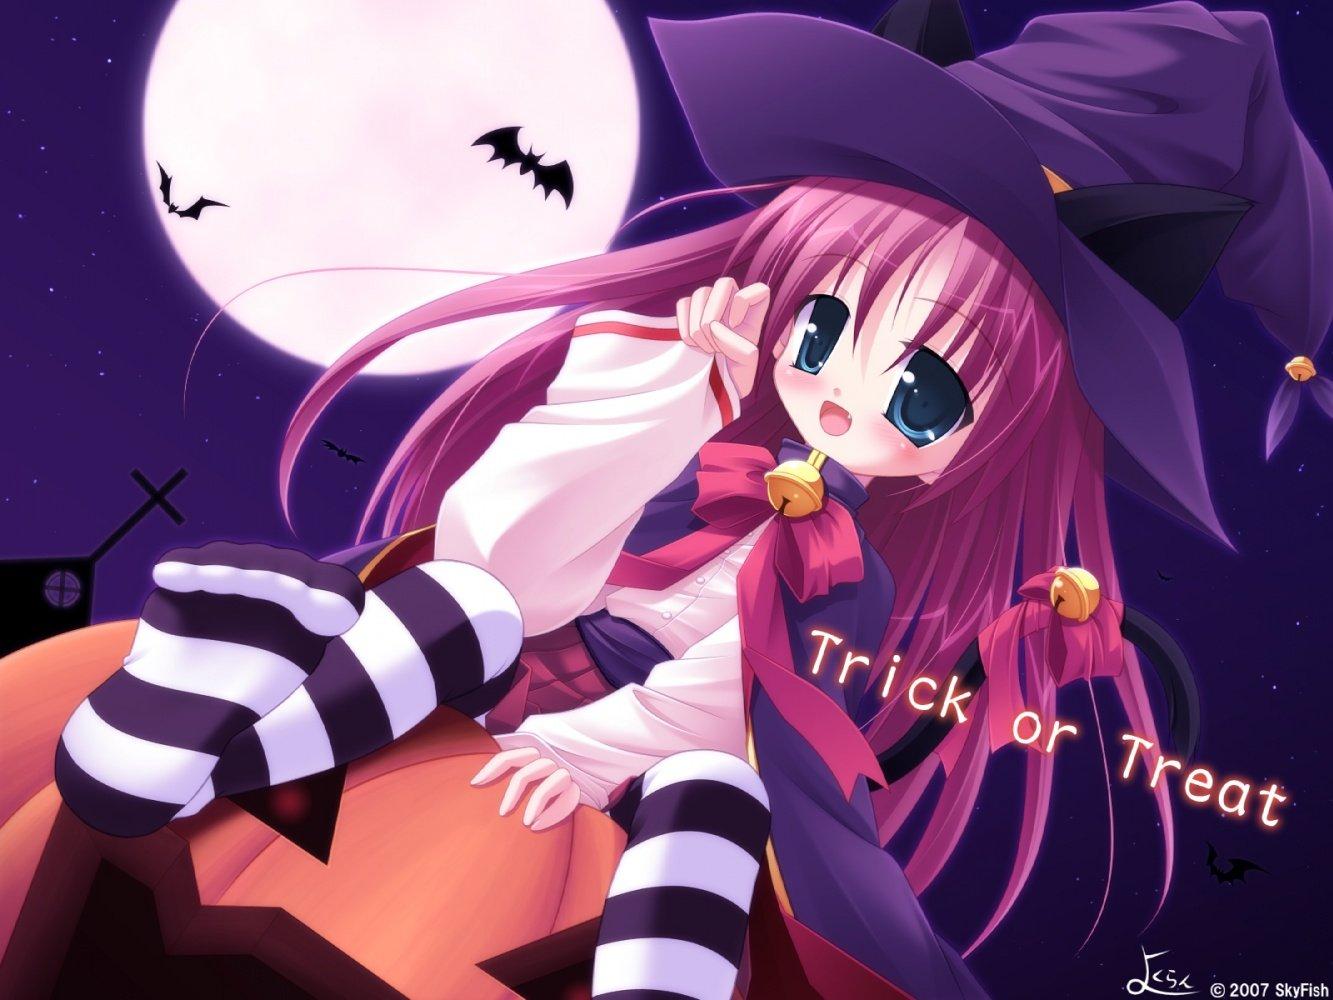 http://4.bp.blogspot.com/_SNcJFOCi7wI/TLH93KgpdRI/AAAAAAAAALs/XiAaem1WeYM/s1600/91_Anime_Anime_Girls_Anime_Wallpaper.jpg